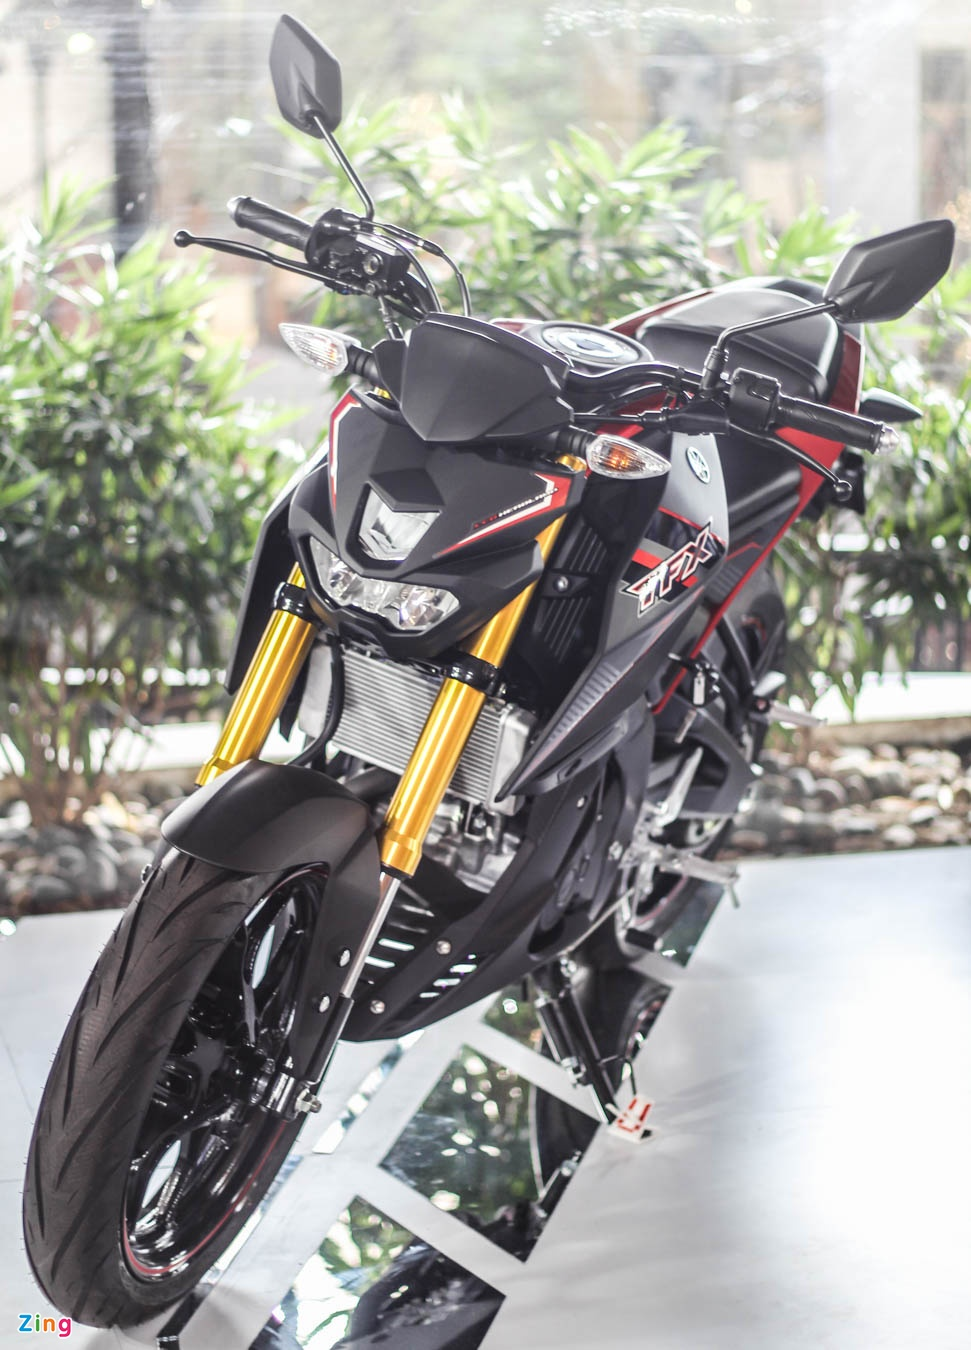 Chi tiet Yamaha TFX150 - xe con tay 150 cc vua ra mat tai VN hinh anh 4